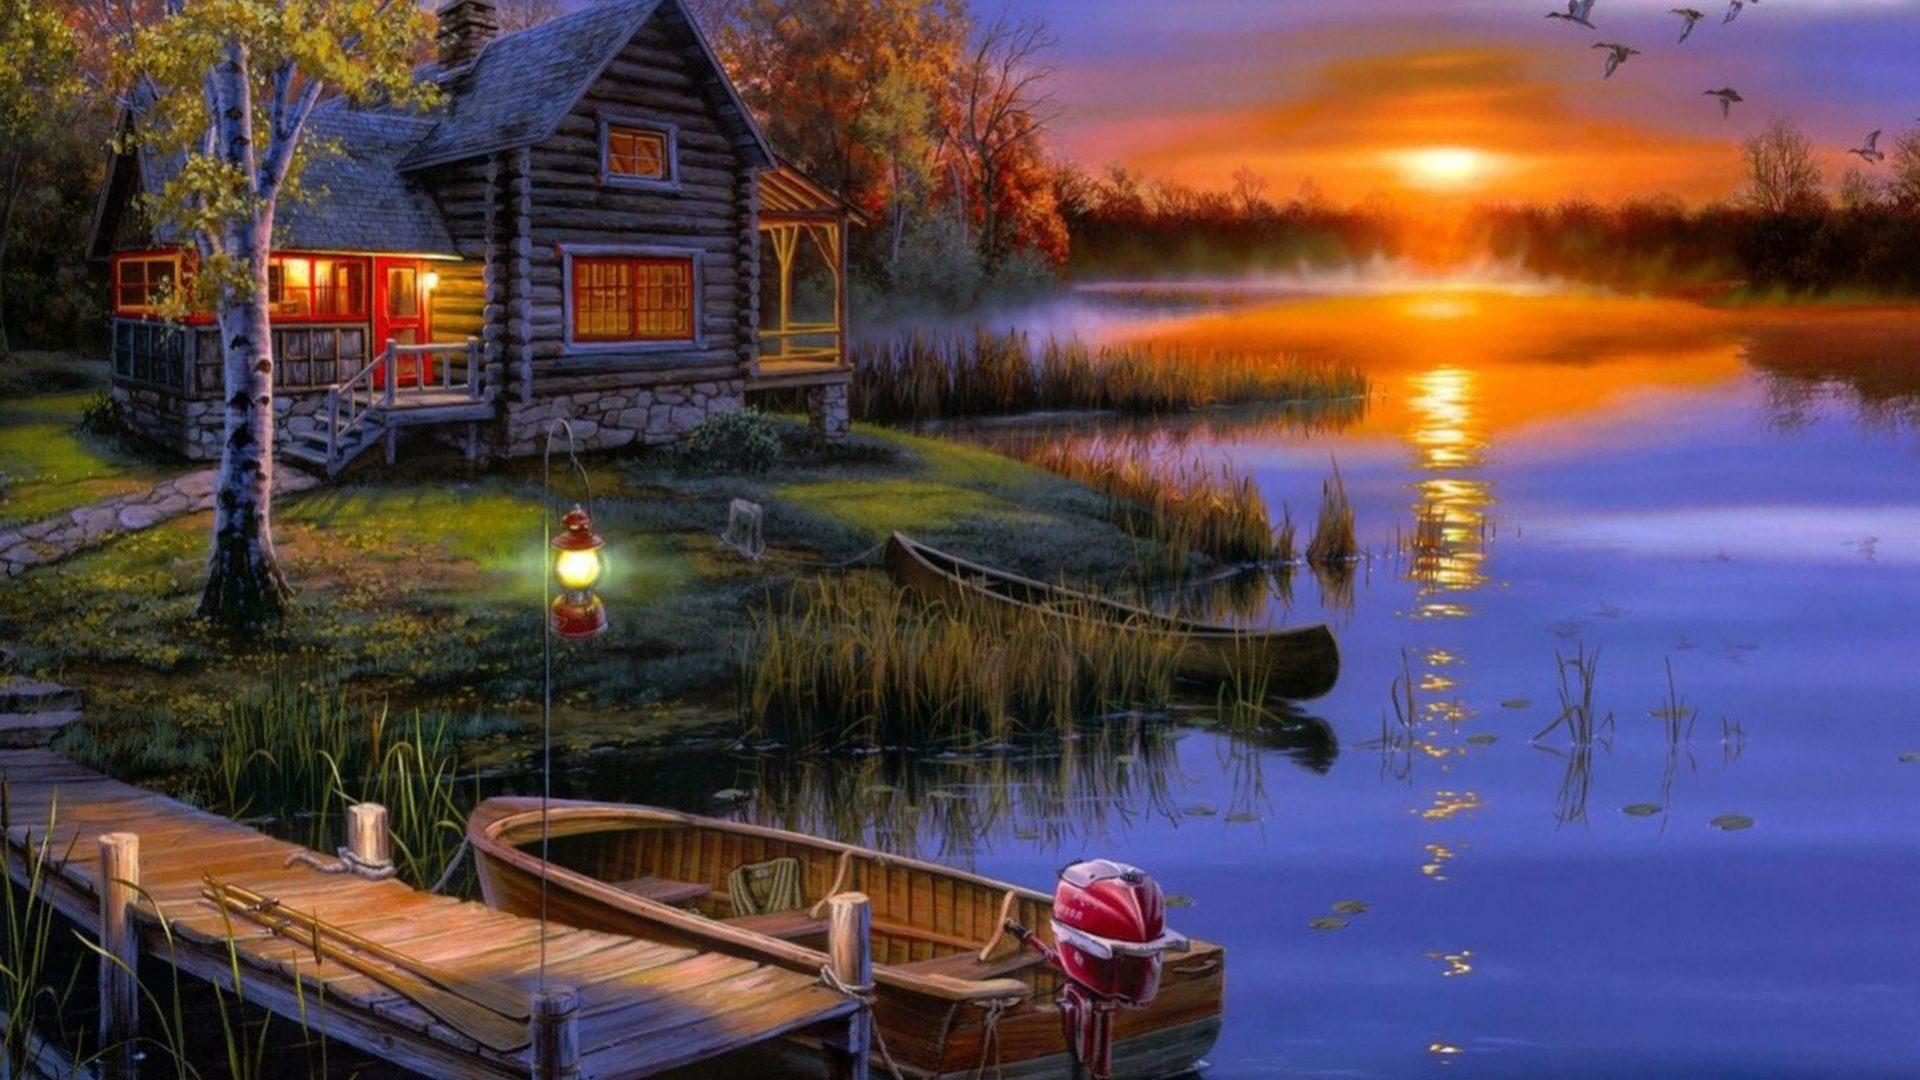 House Lake Sunset Wallpaper 08453